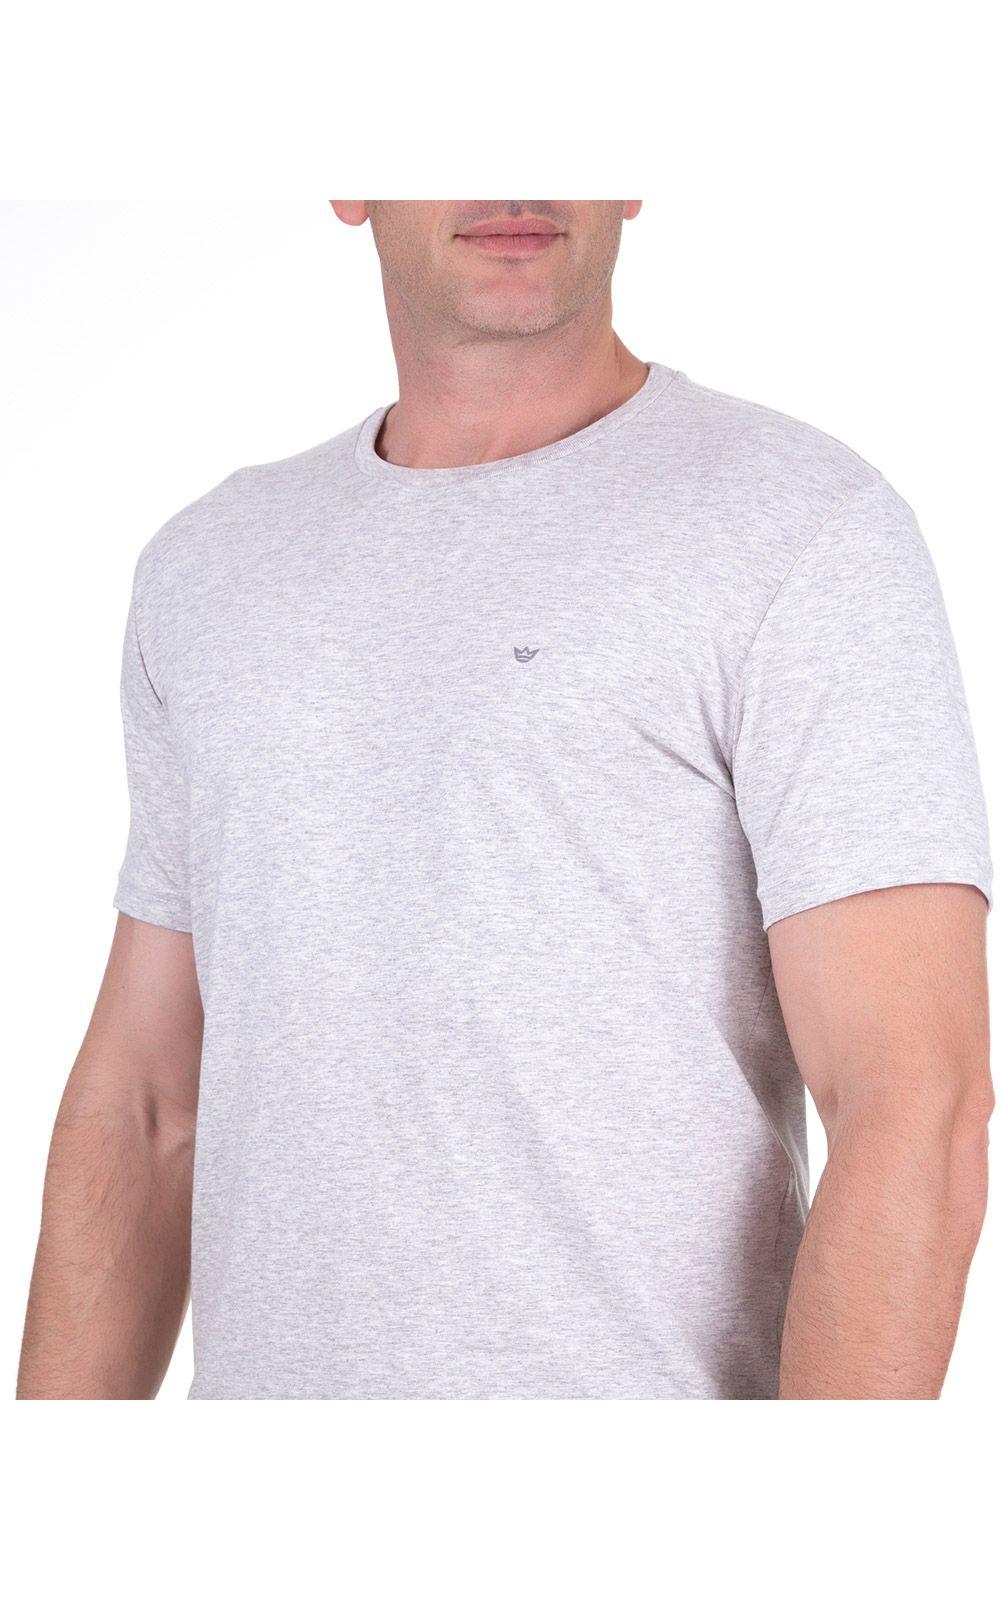 Foto 3 - Camiseta Masculina Cinza Claro Lisa